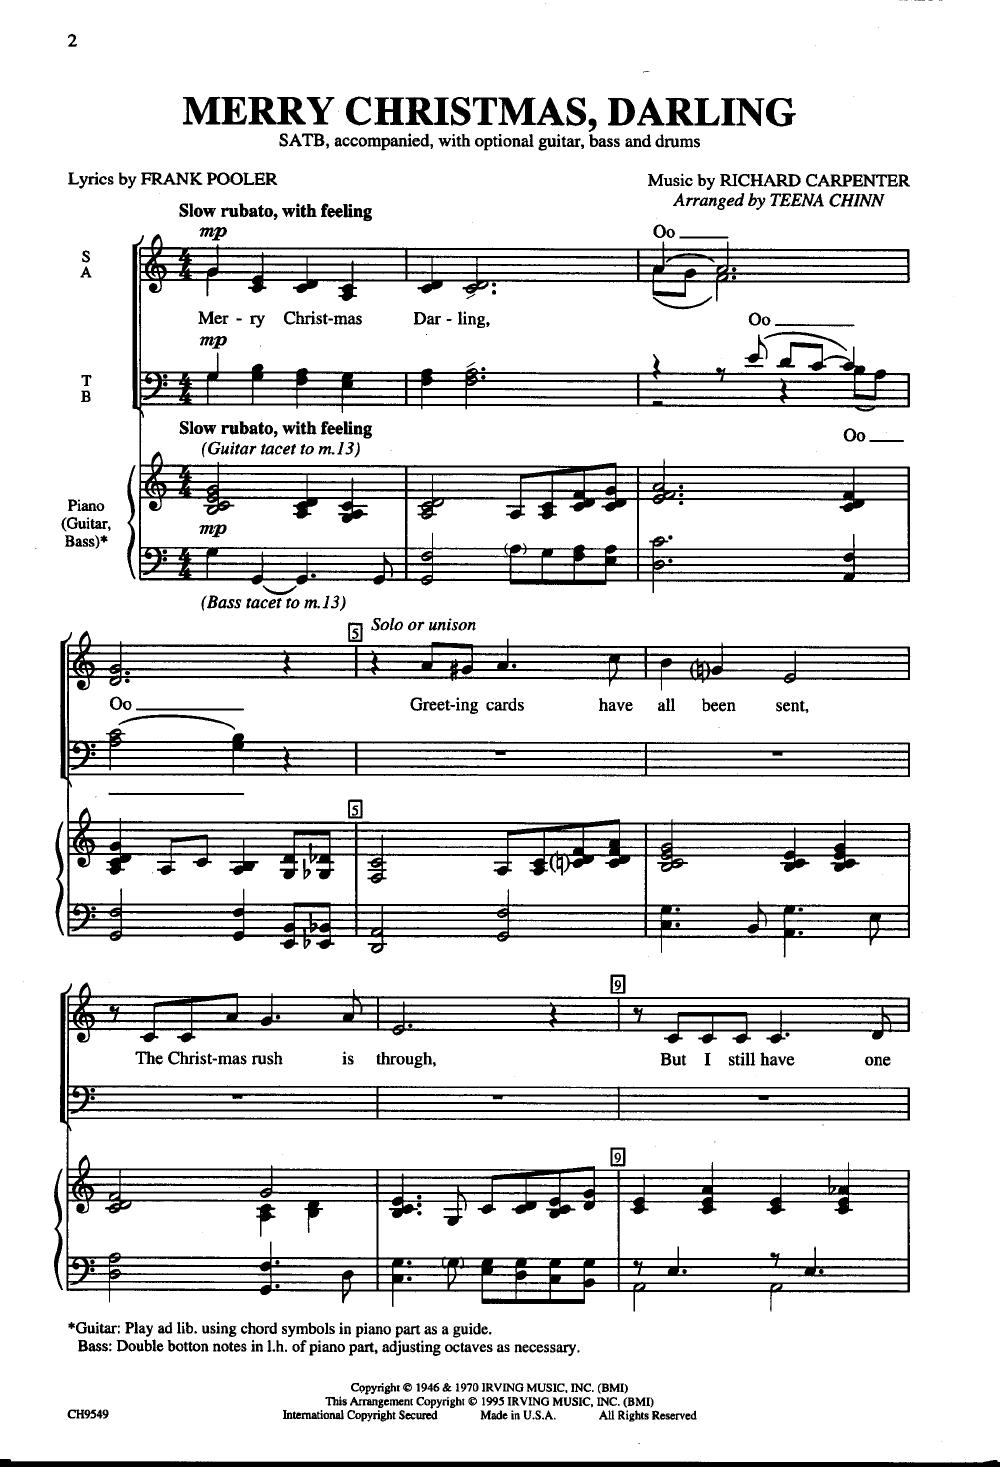 Merry Christmas Darling Chords And Lyrics Driveeapusedmotorhome